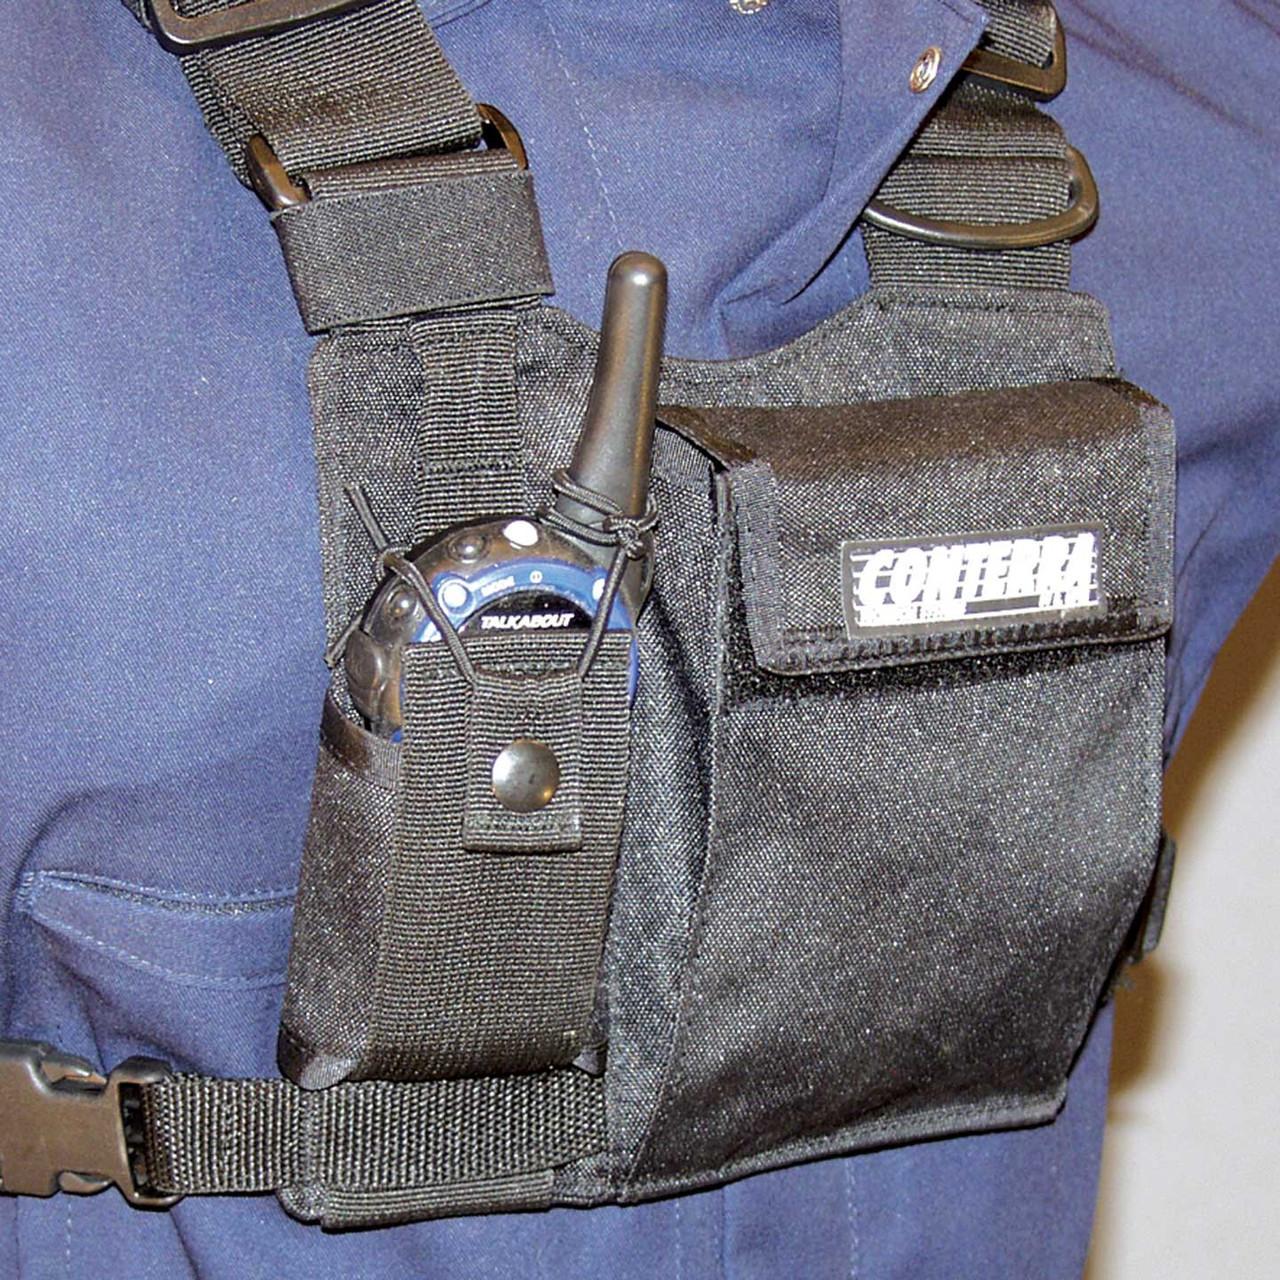 AdjustaProFRS__06101.1459363795?c=2 adjusta pro radio harness conterra radio harness color code at bayanpartner.co